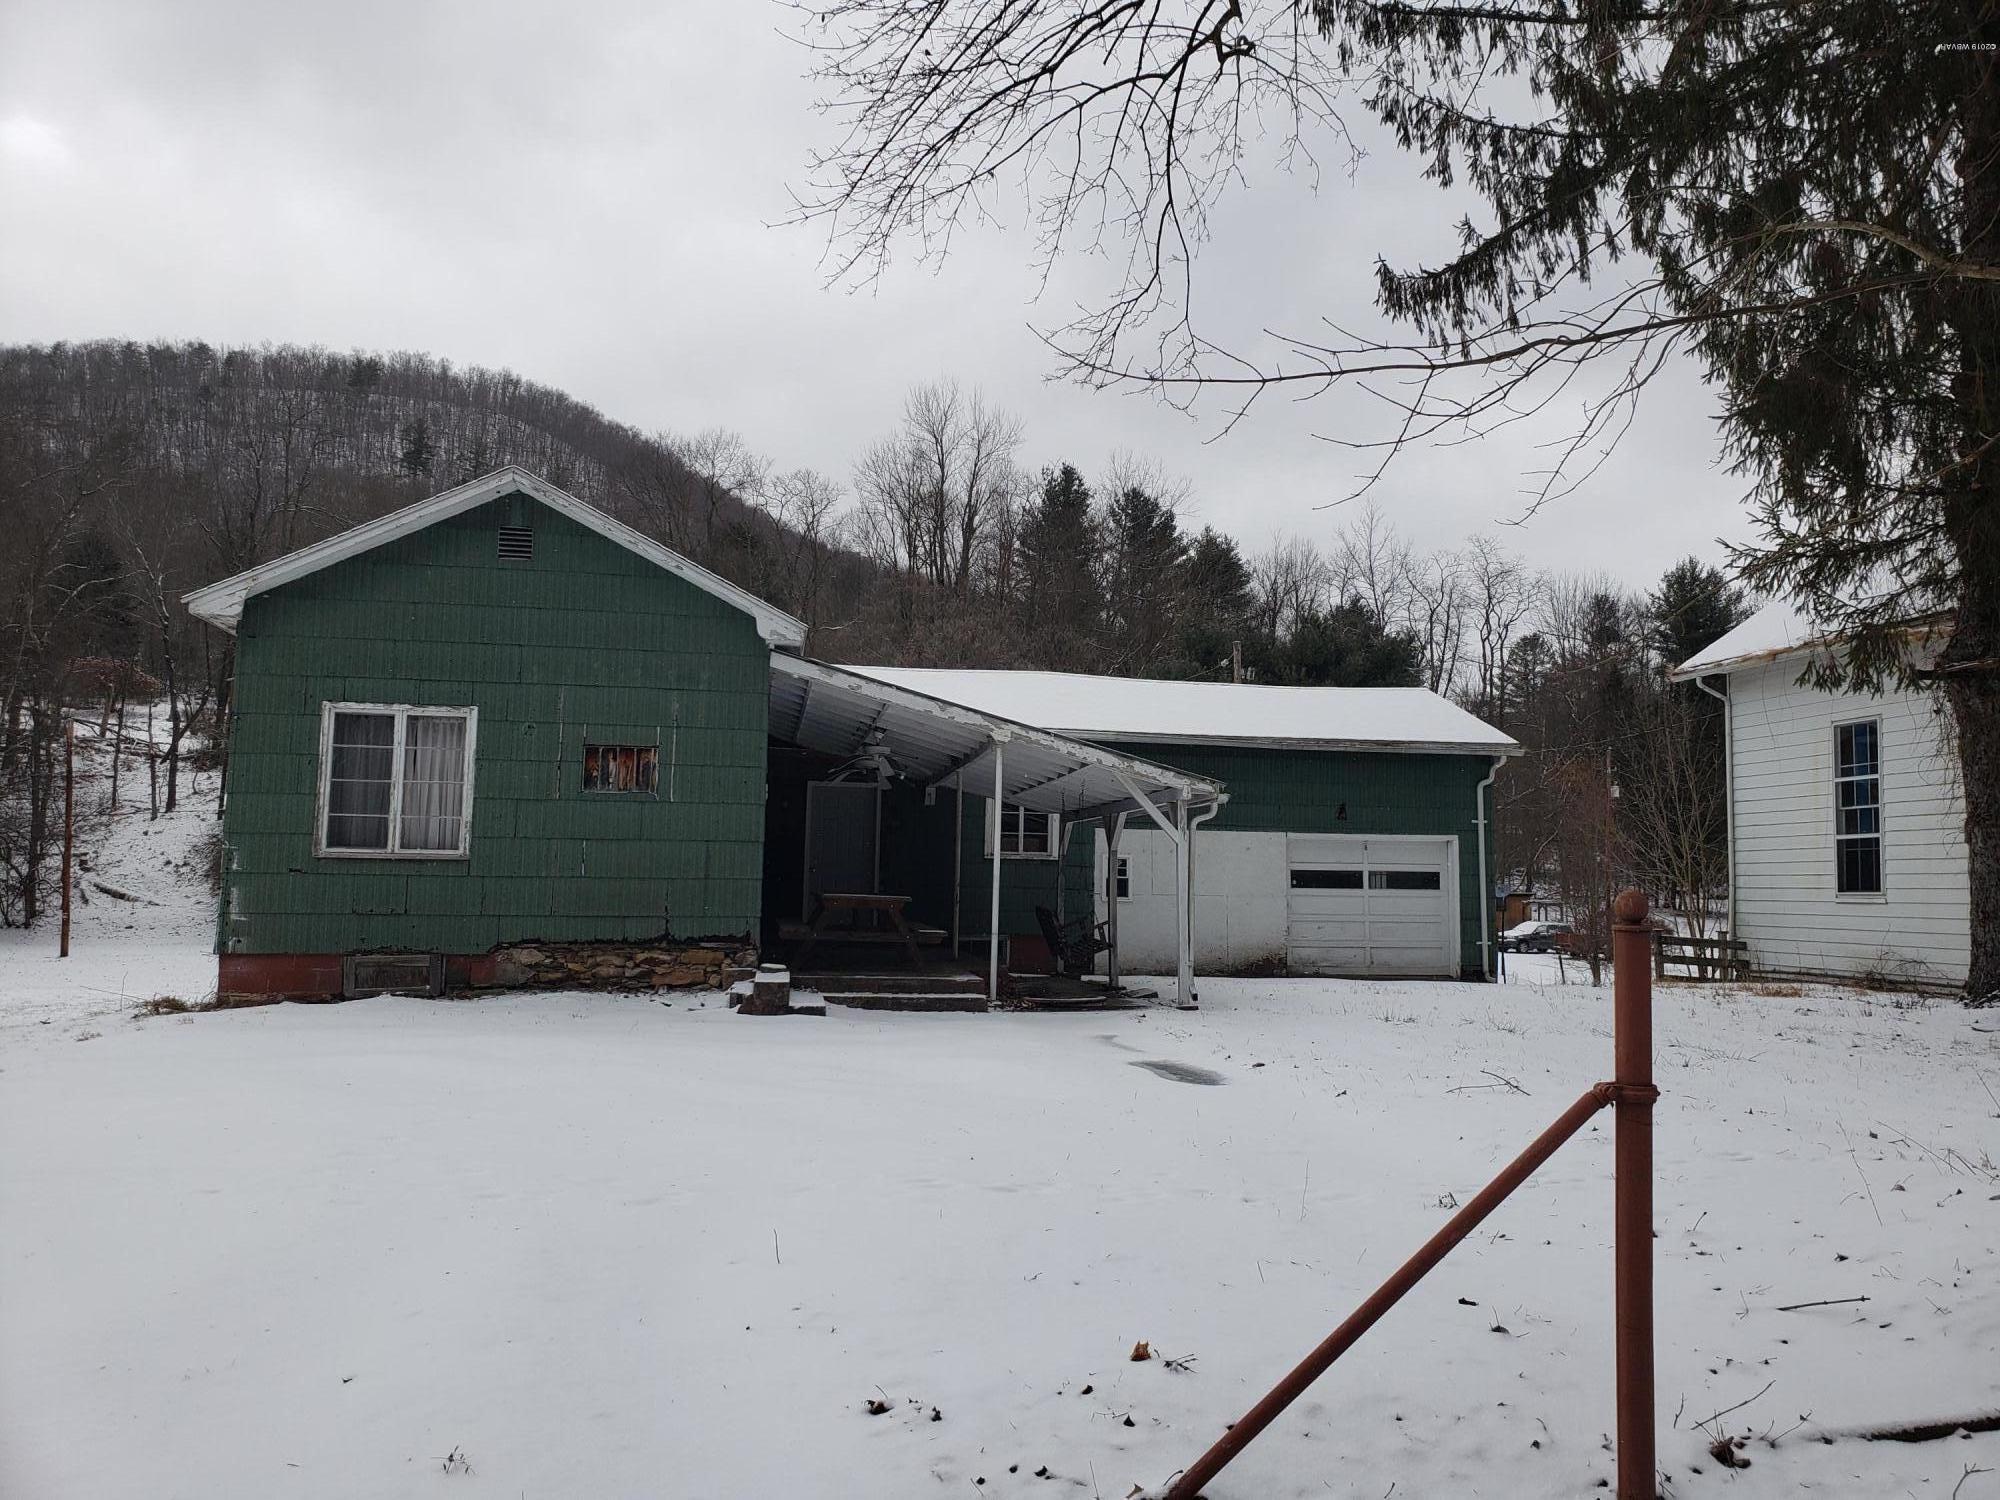 86 KETTLE CREEK ROAD,Westport,PA 17778,3 Bedrooms Bedrooms,1 BathroomBathrooms,Cabin/vacation home,KETTLE CREEK,WB-86464